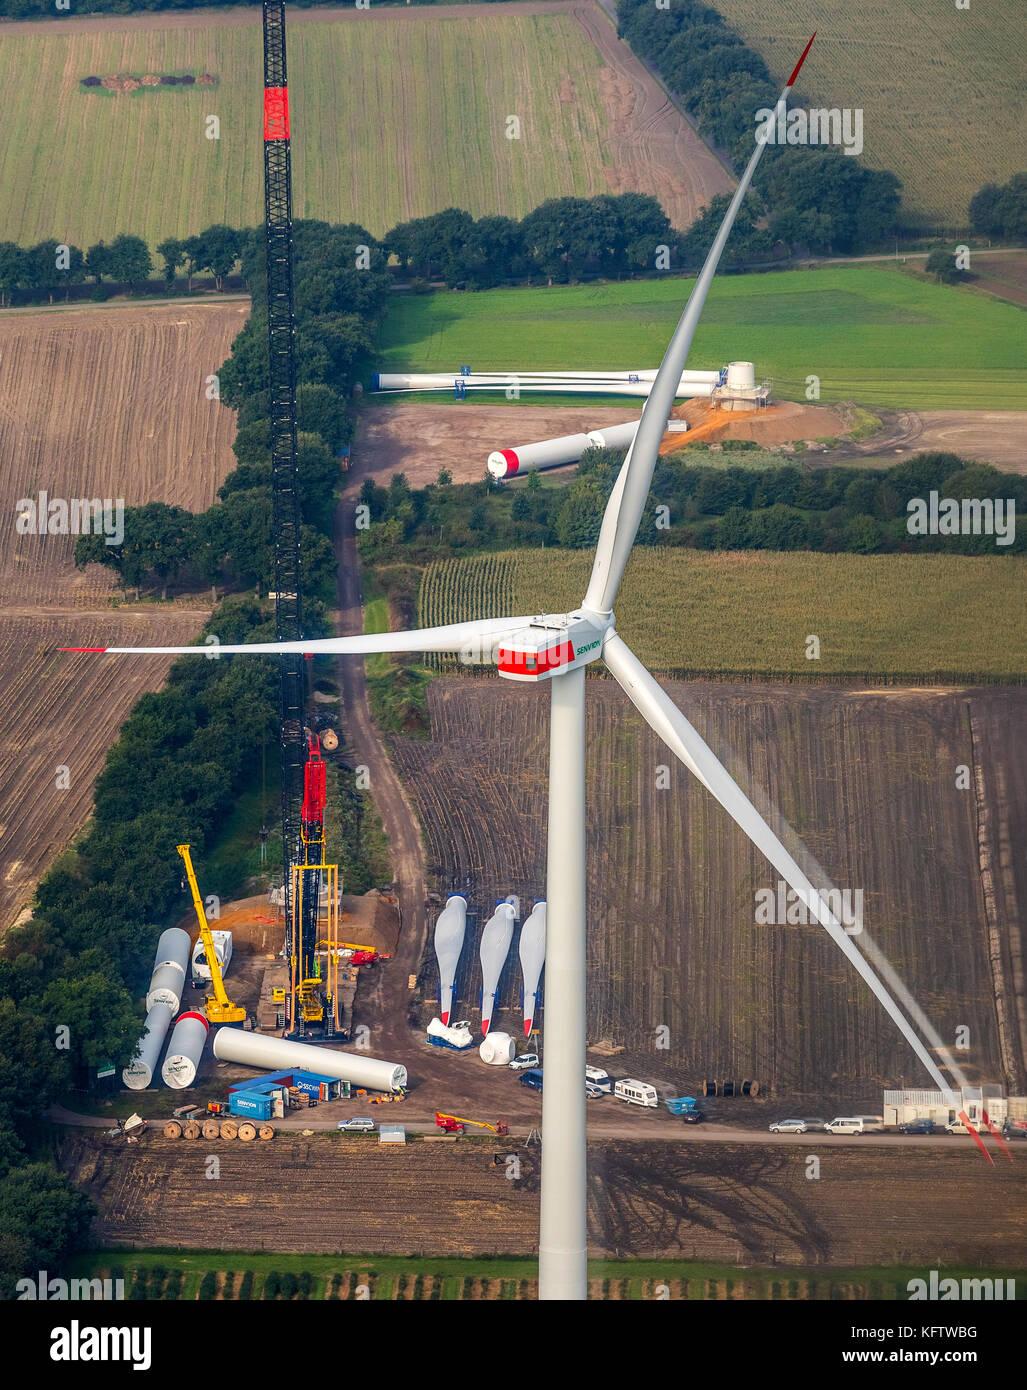 in Schermbeck on the city boundary to Dorsten arise wind power plants, alternative energy, regenerative energy, - Stock Image